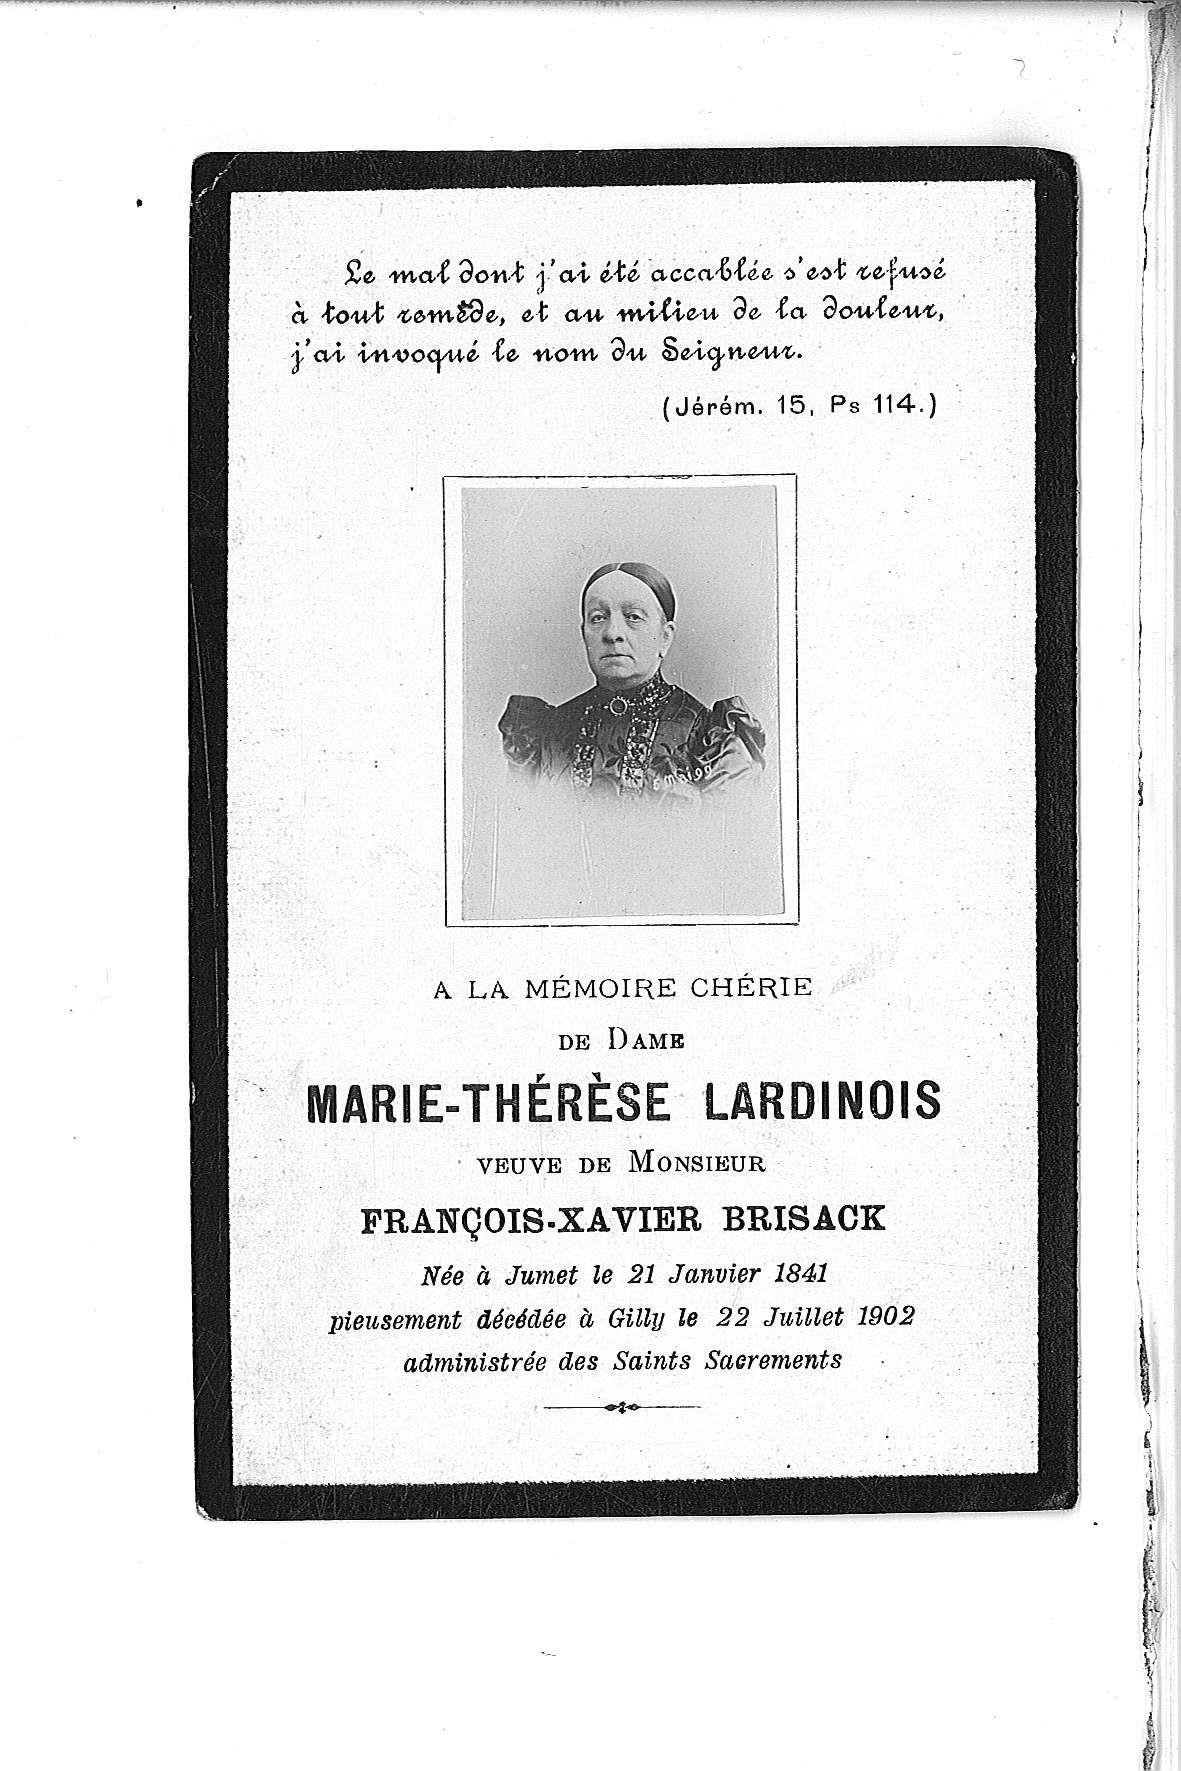 Marie-Thérèse(1902)20111004152800_00005.jpg